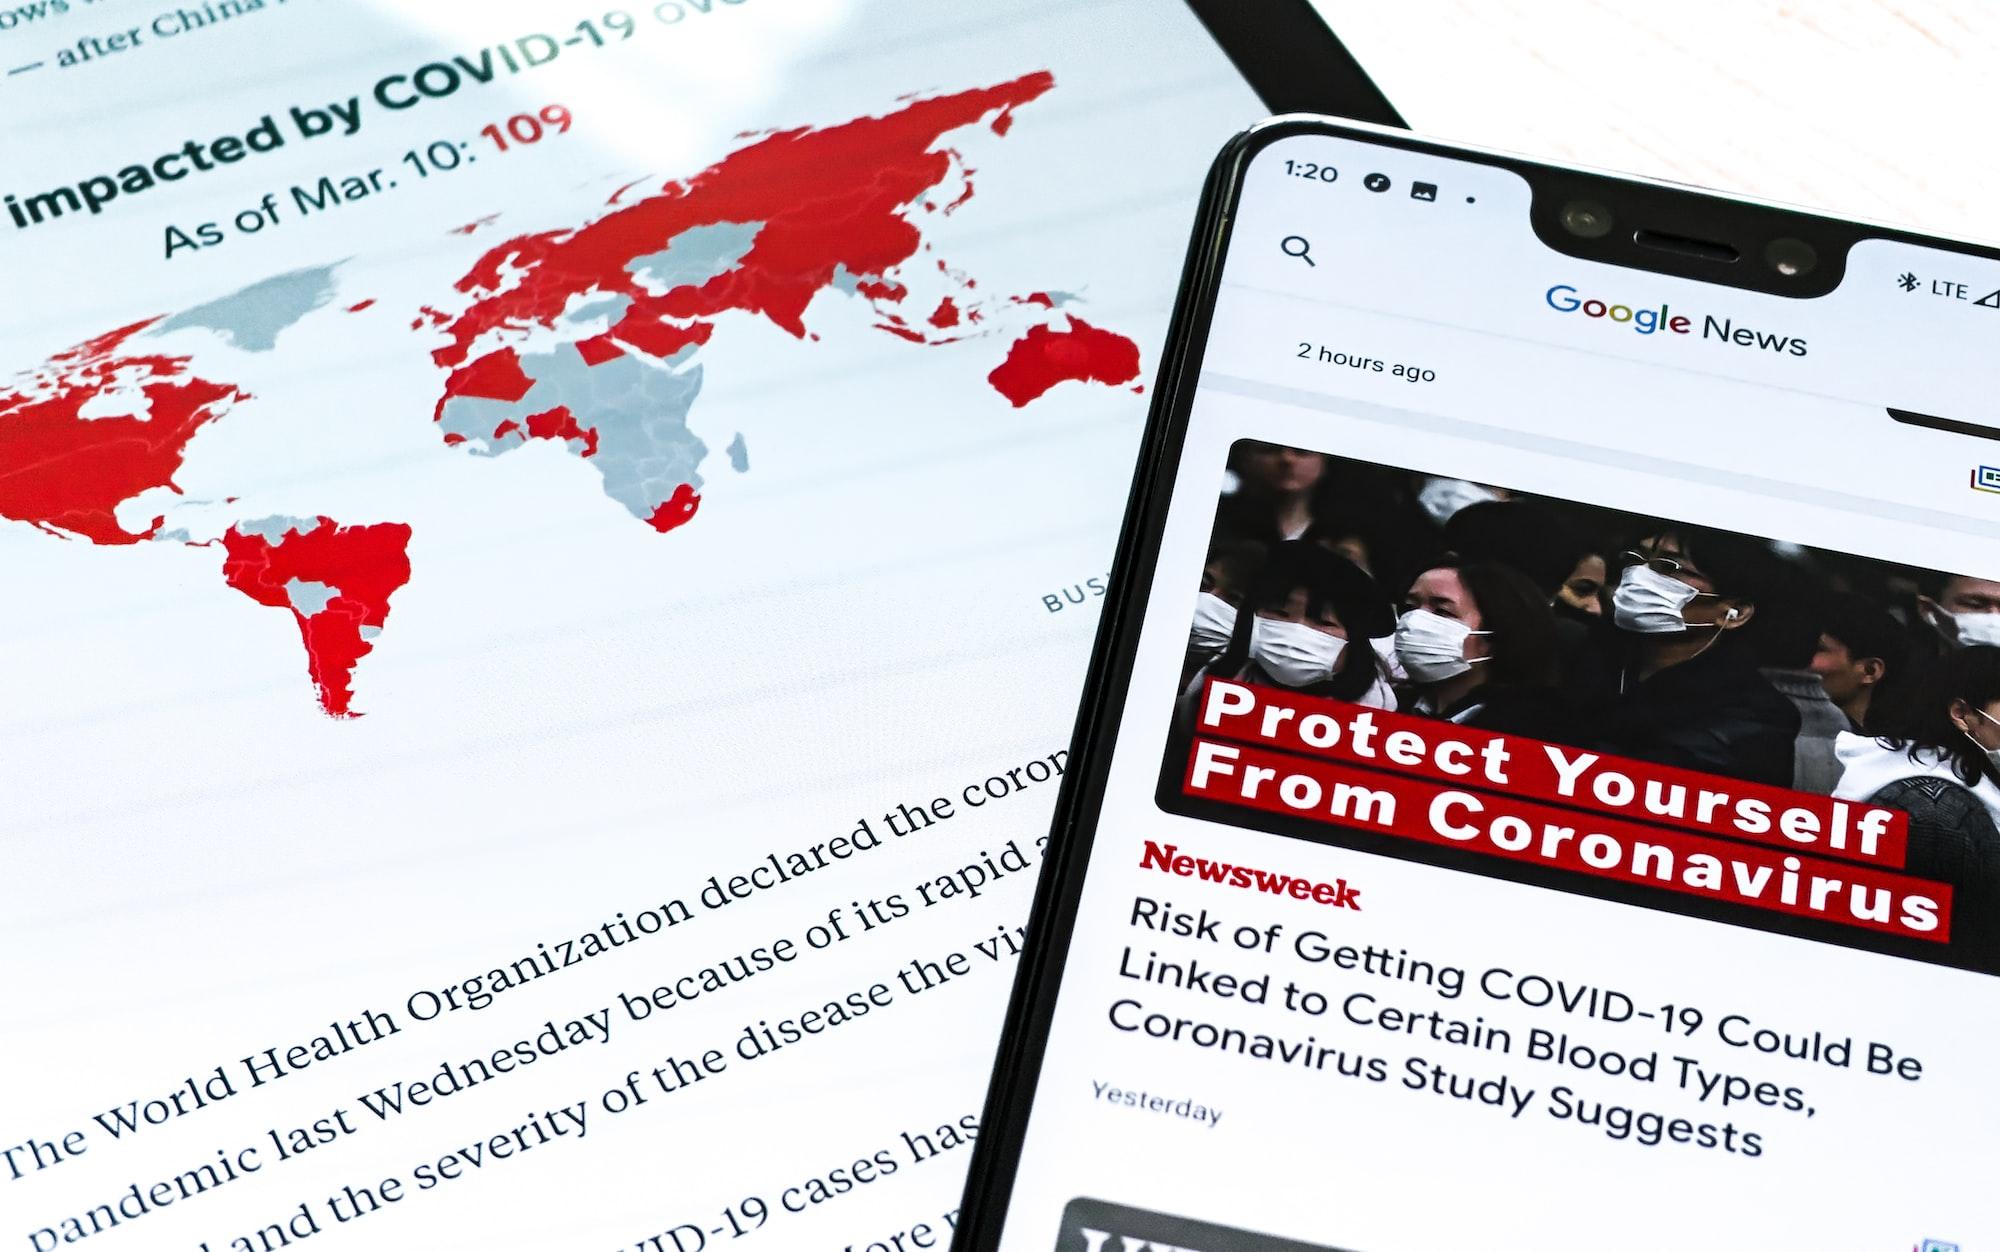 A Samsung Galaxy Tab S and Google Pixel 3XL show Coronavirus information.